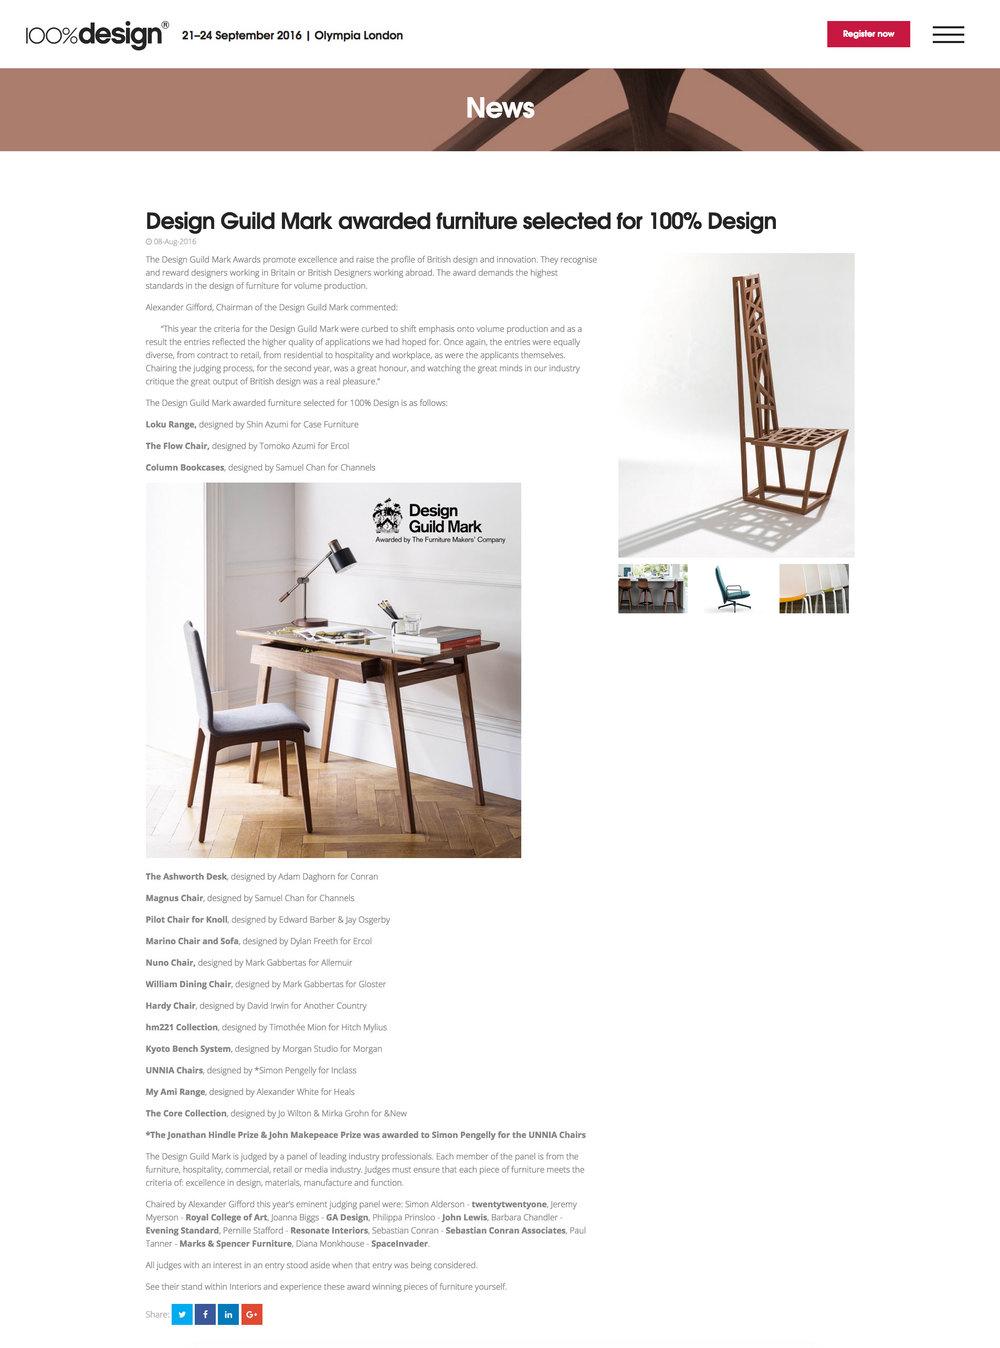 100% Design - News -Aug 2016  M&S Home